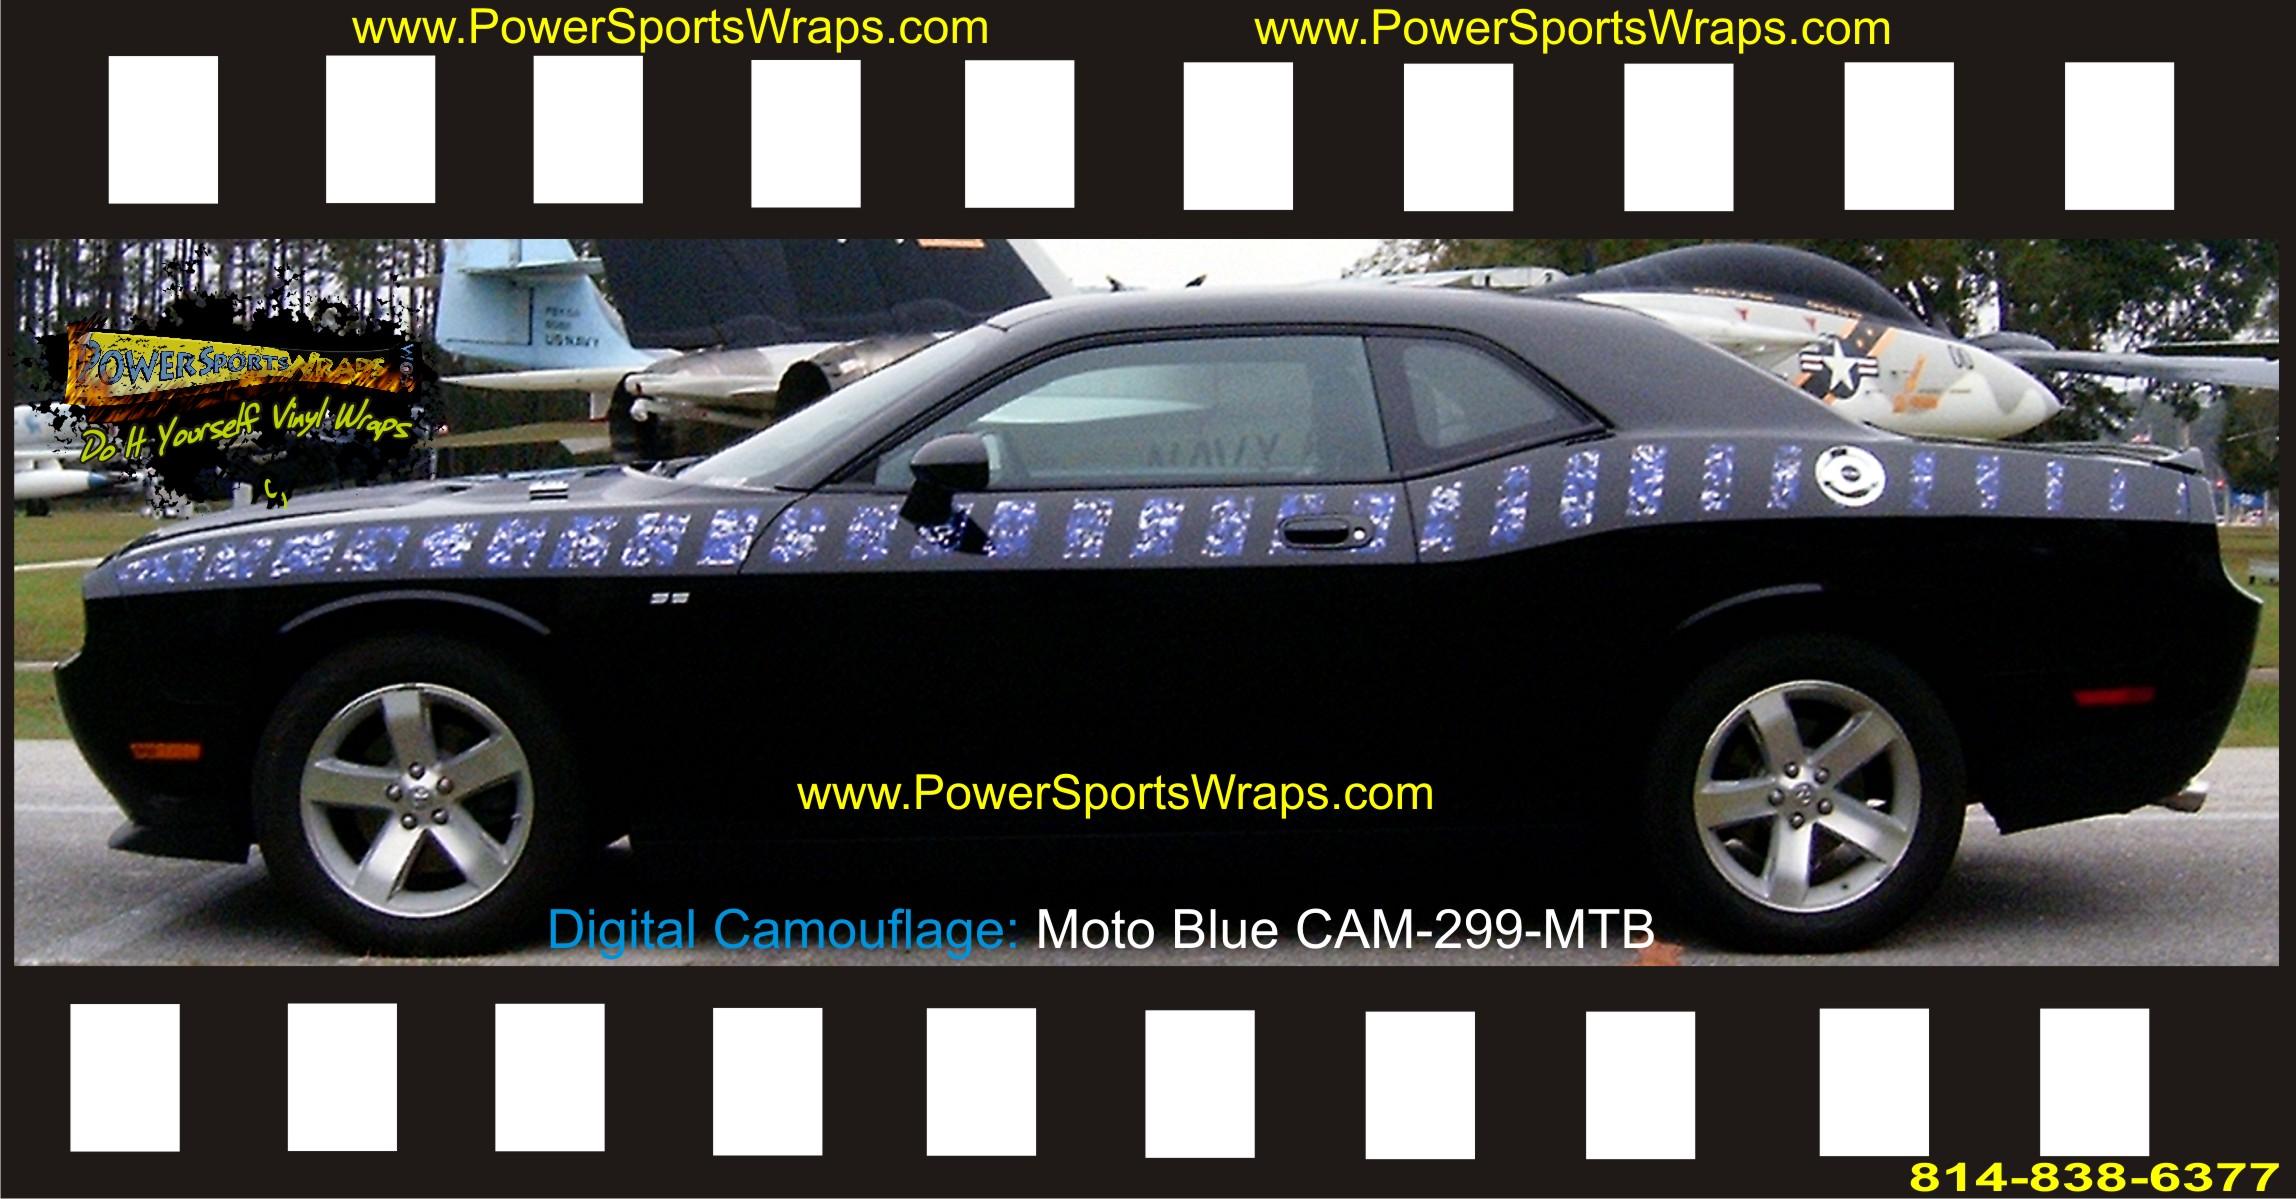 2010 Dodge Challenger Custom Digital Camo Graphics Moto